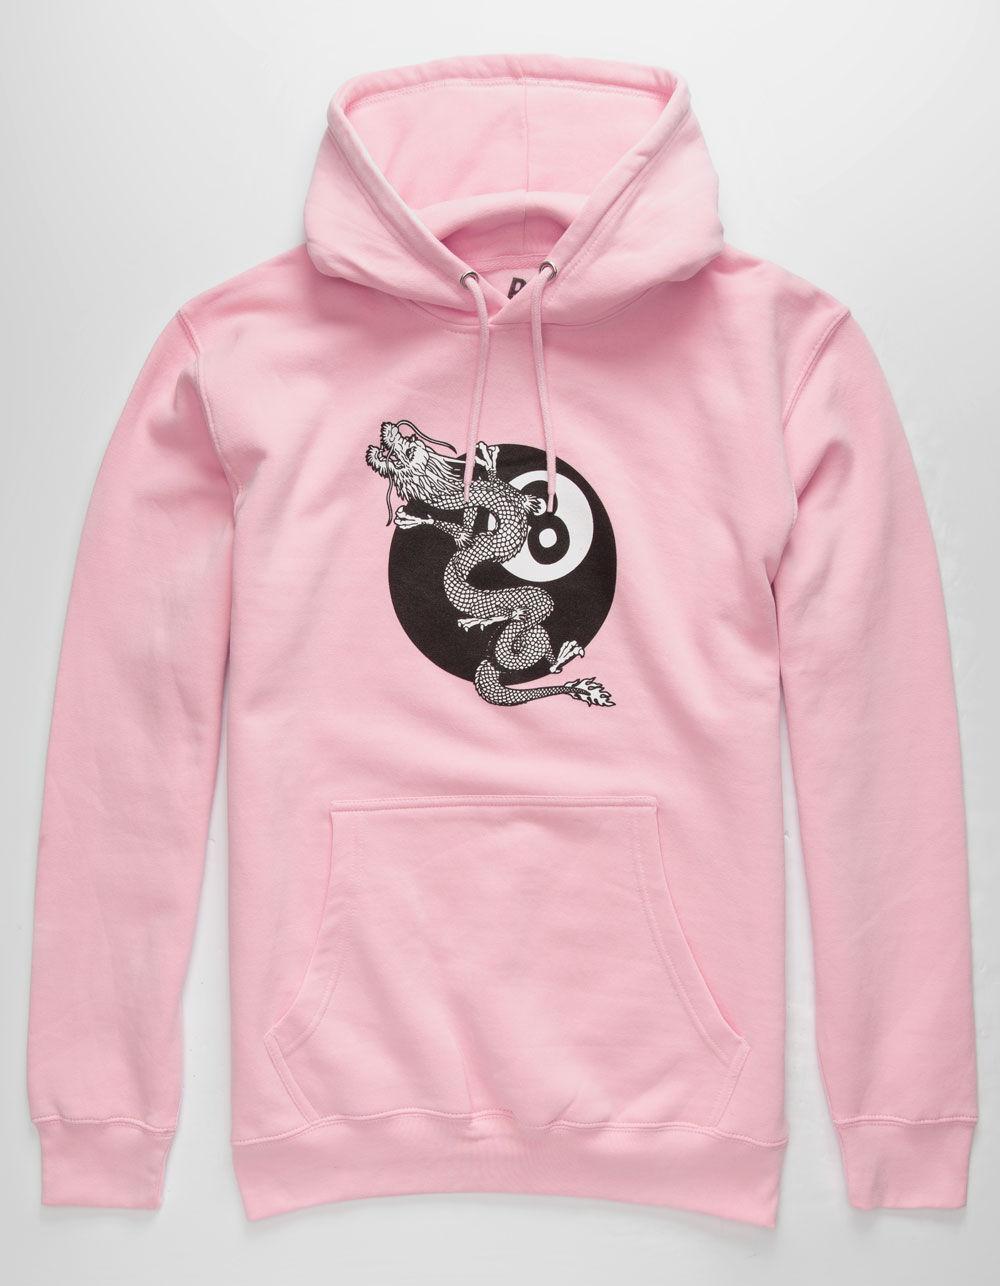 RSQ Billiards Pink Hoodie